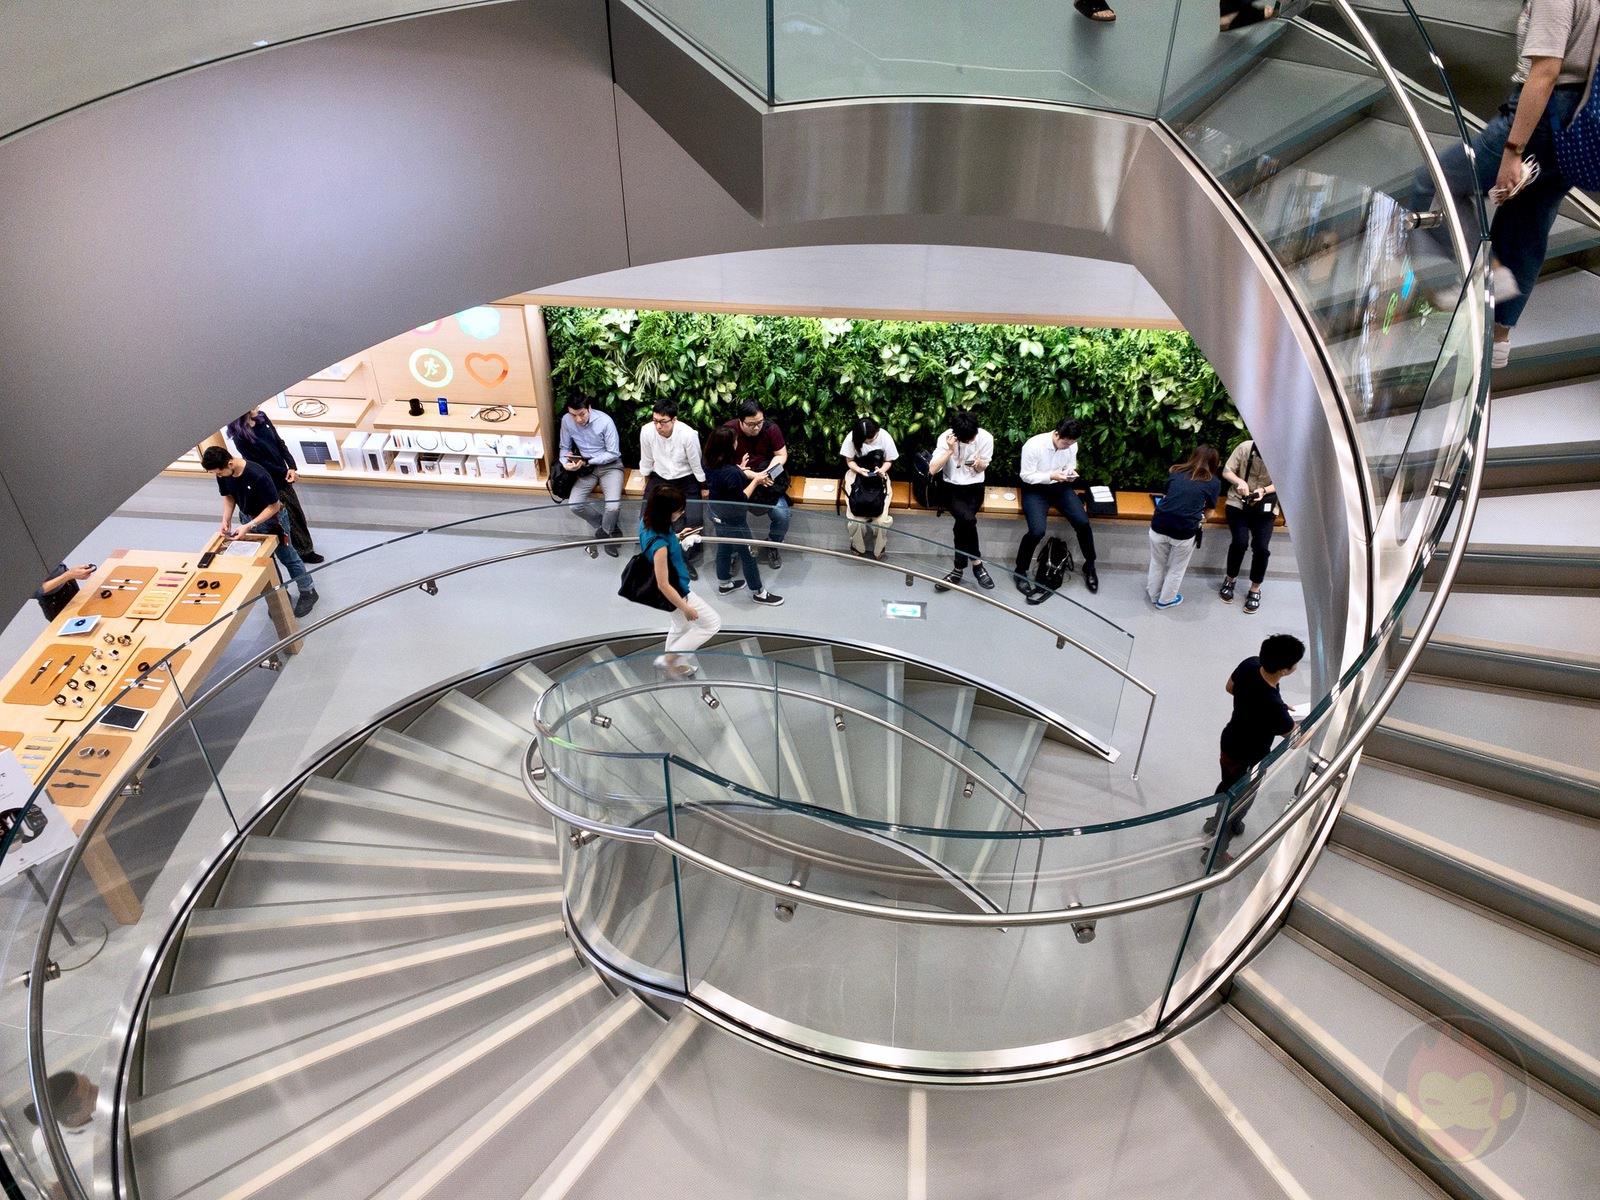 Apple Store Omotesando Basement floor renewal 08